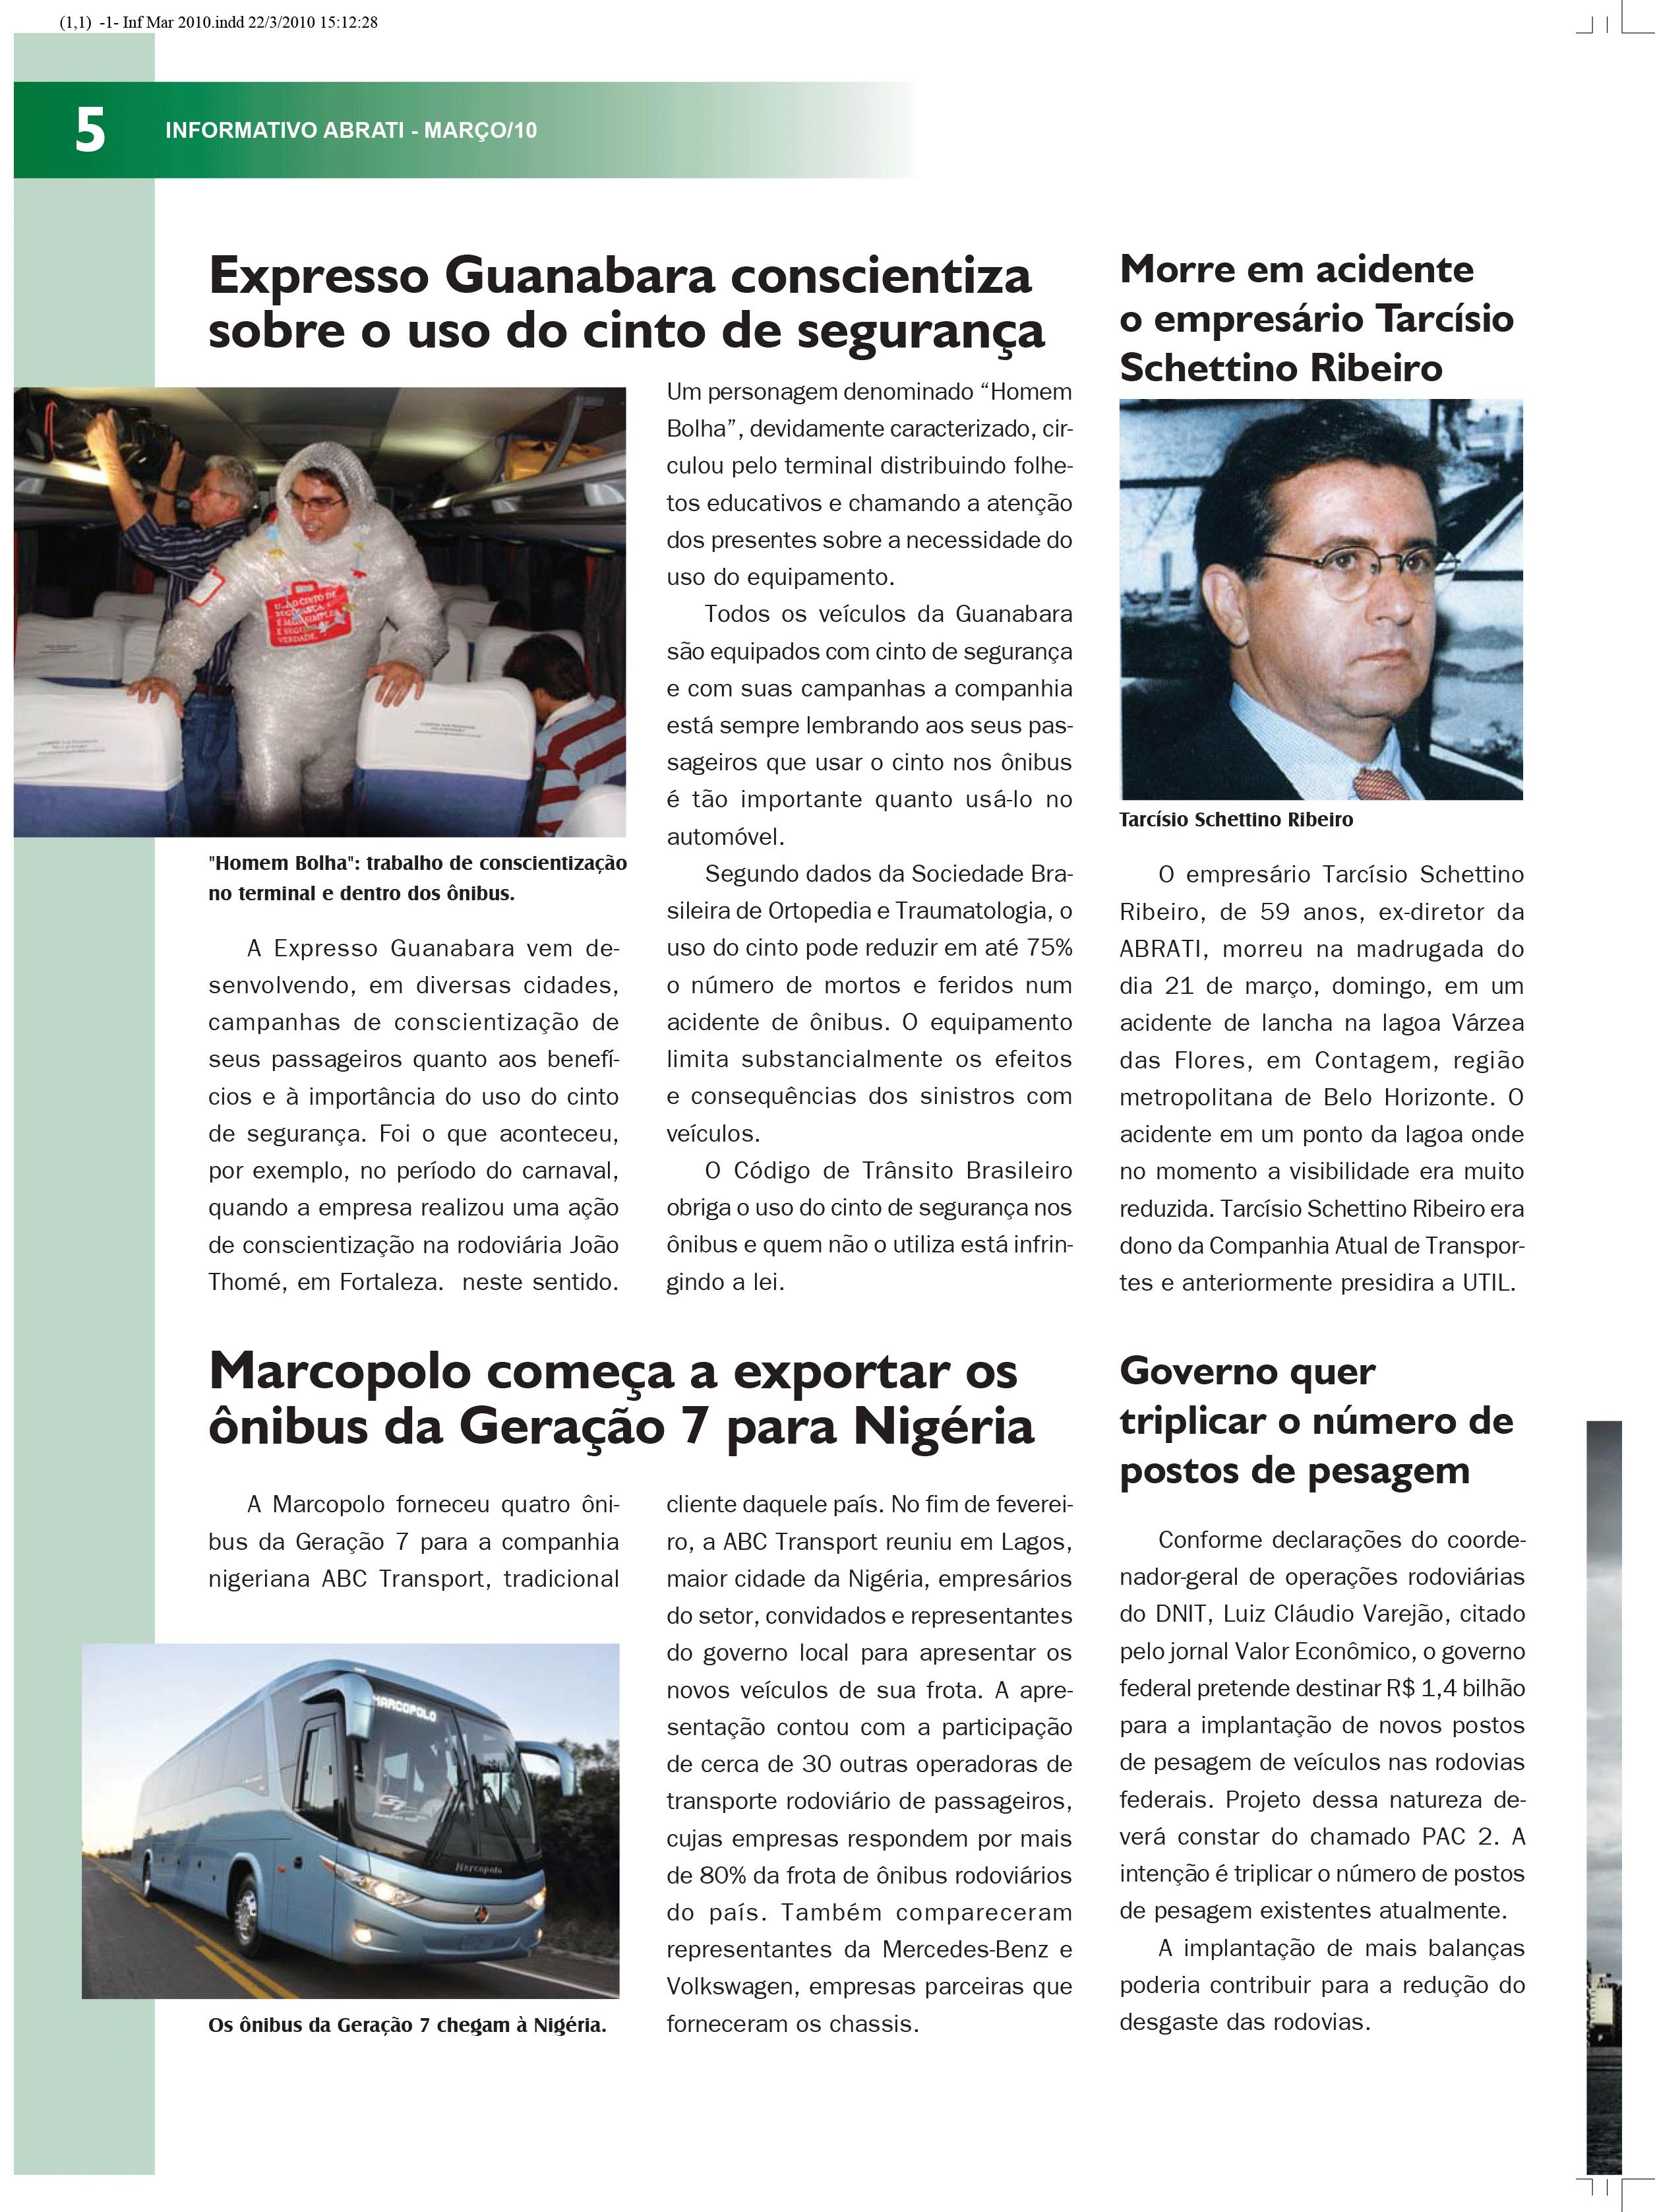 Informativo Março 2010